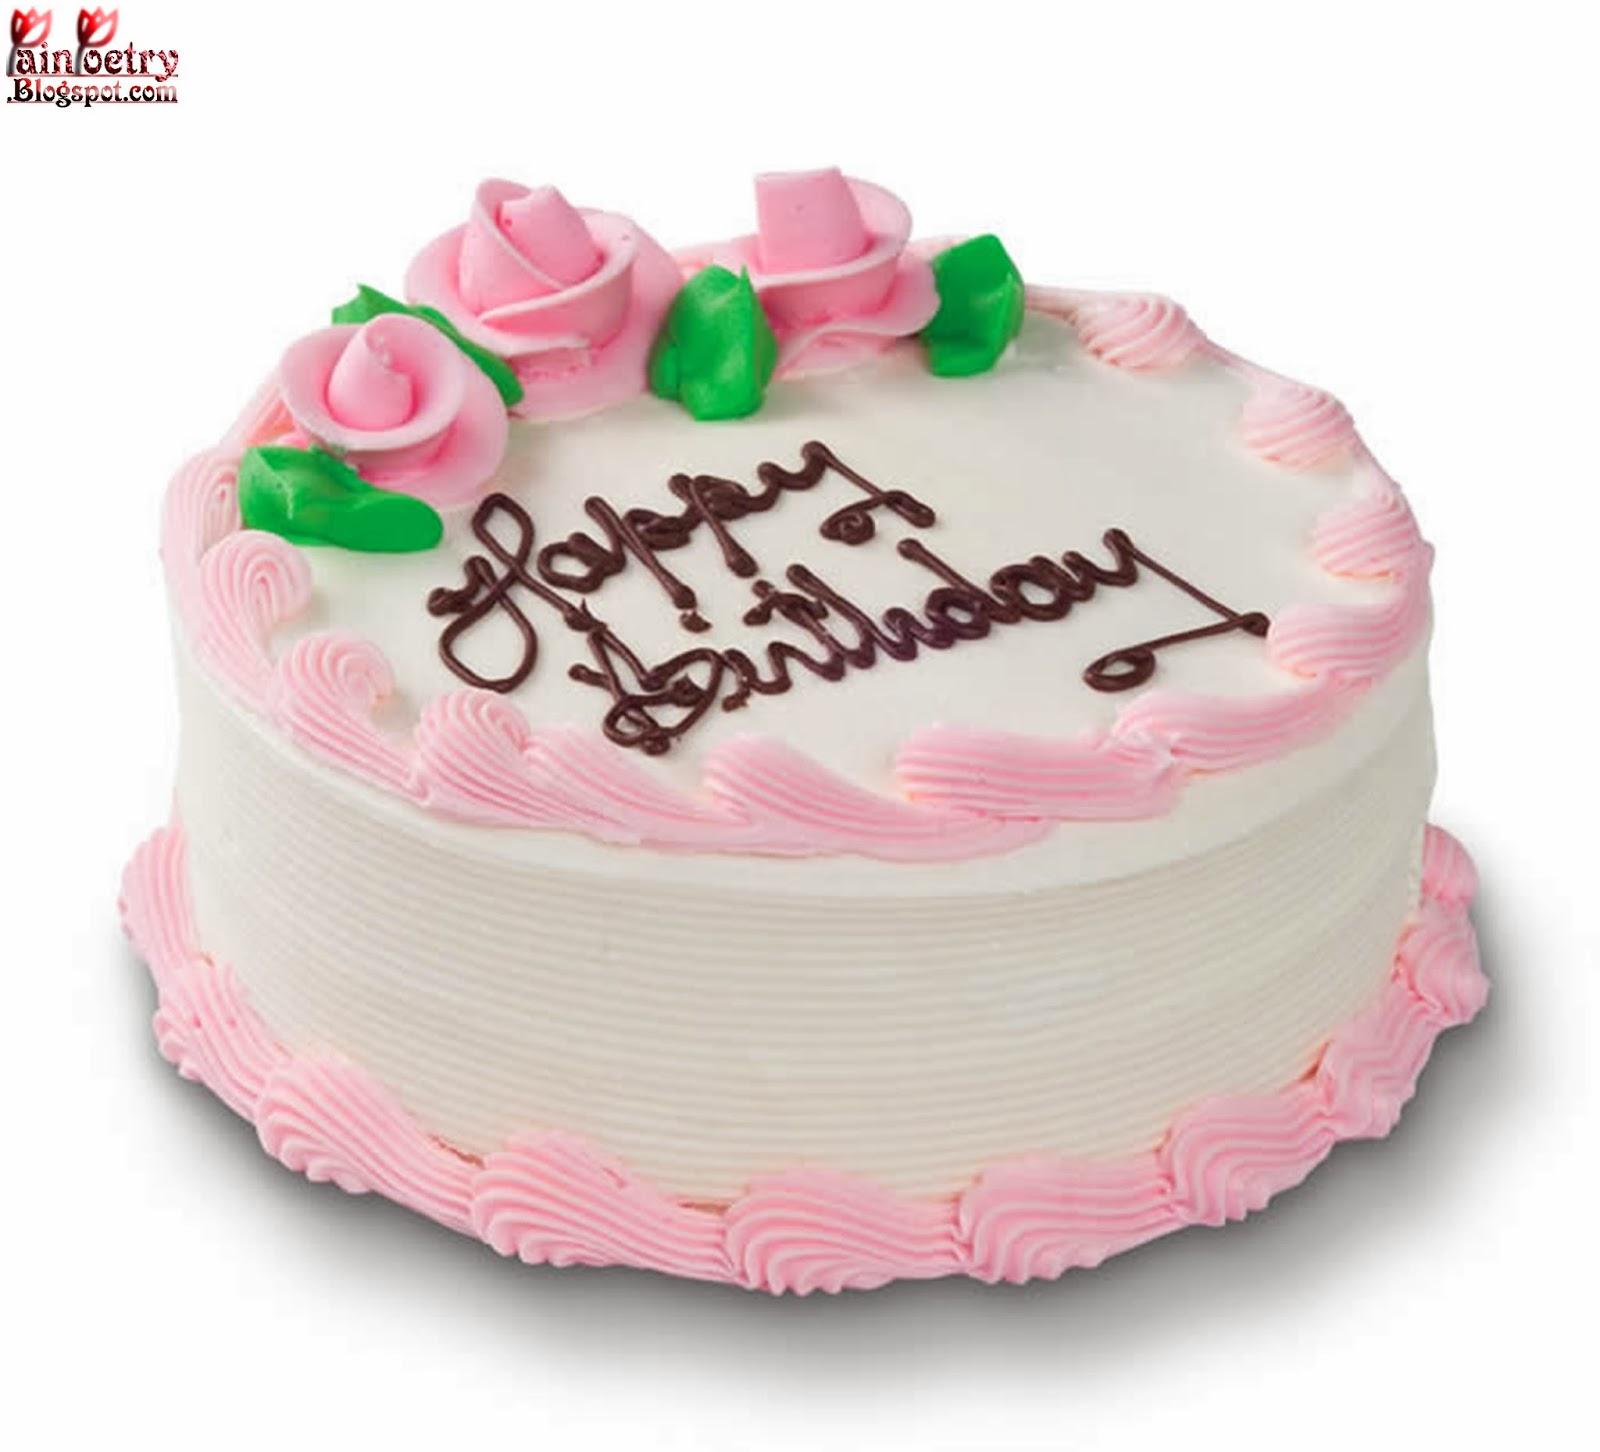 Happy-Birthday-Cold-Cream-Cake-Image-HD-Wide